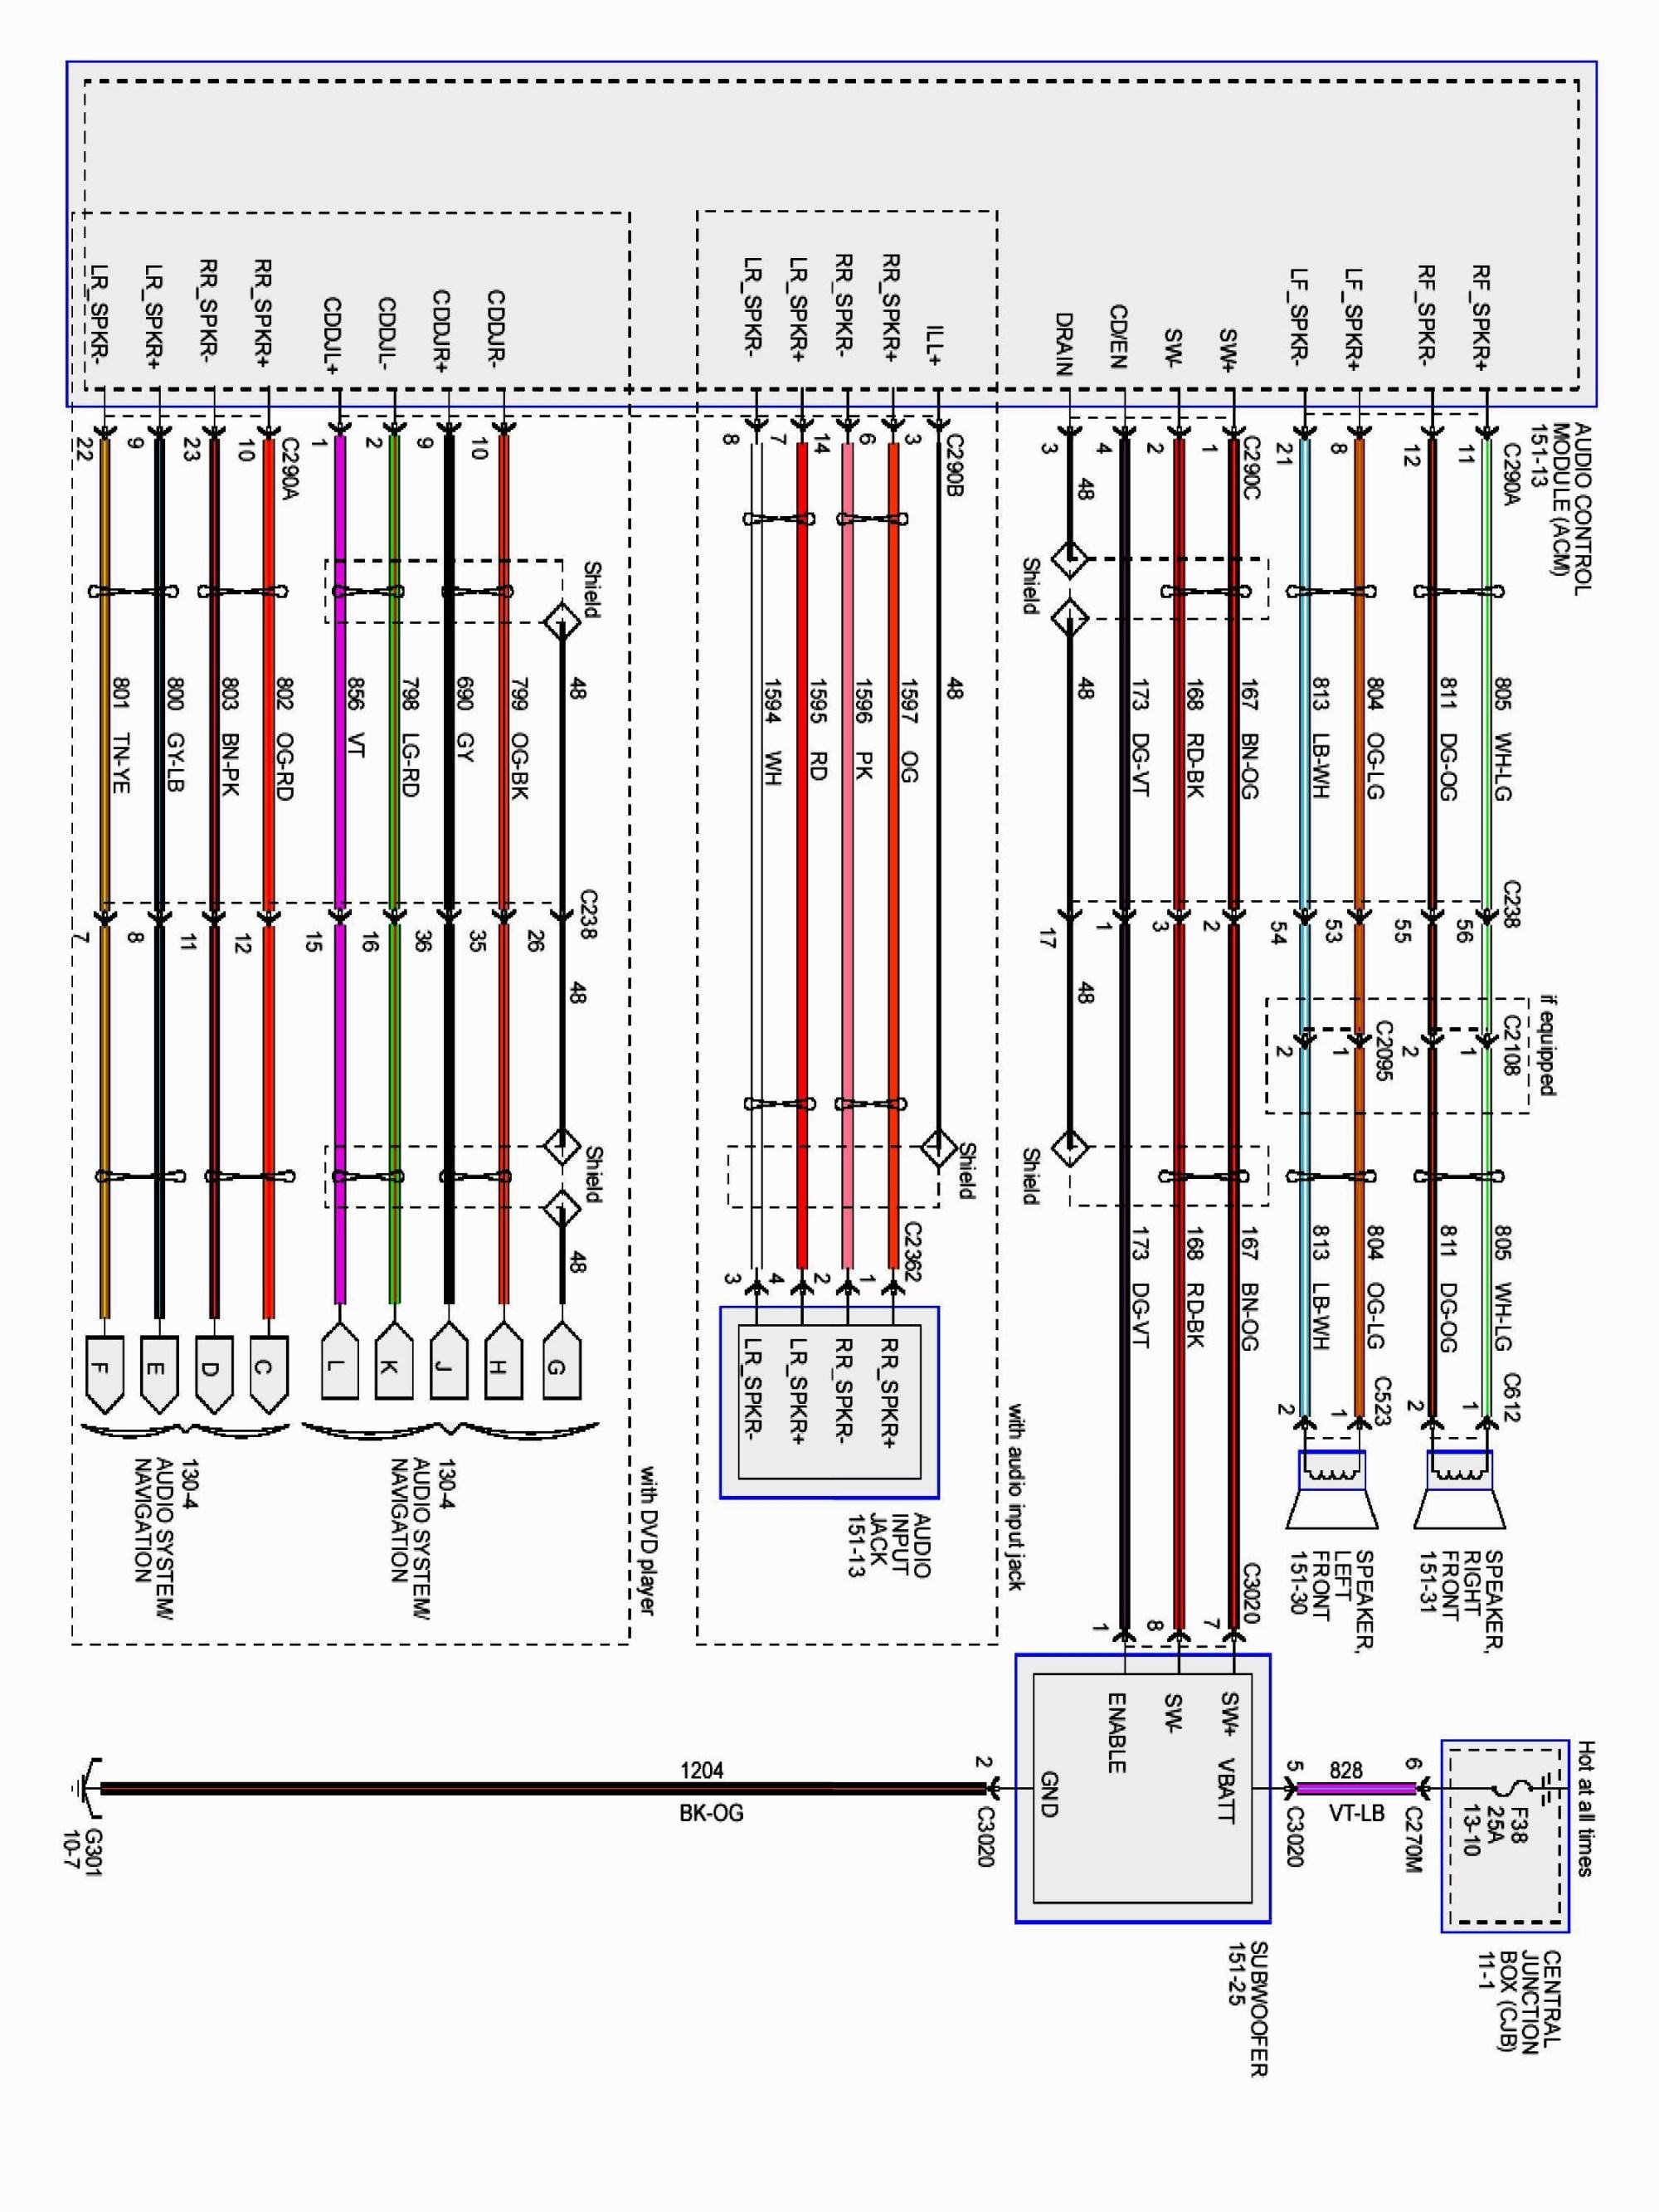 hight resolution of 2006 pontiac g6 radio wiring diagram new wiring diagram image